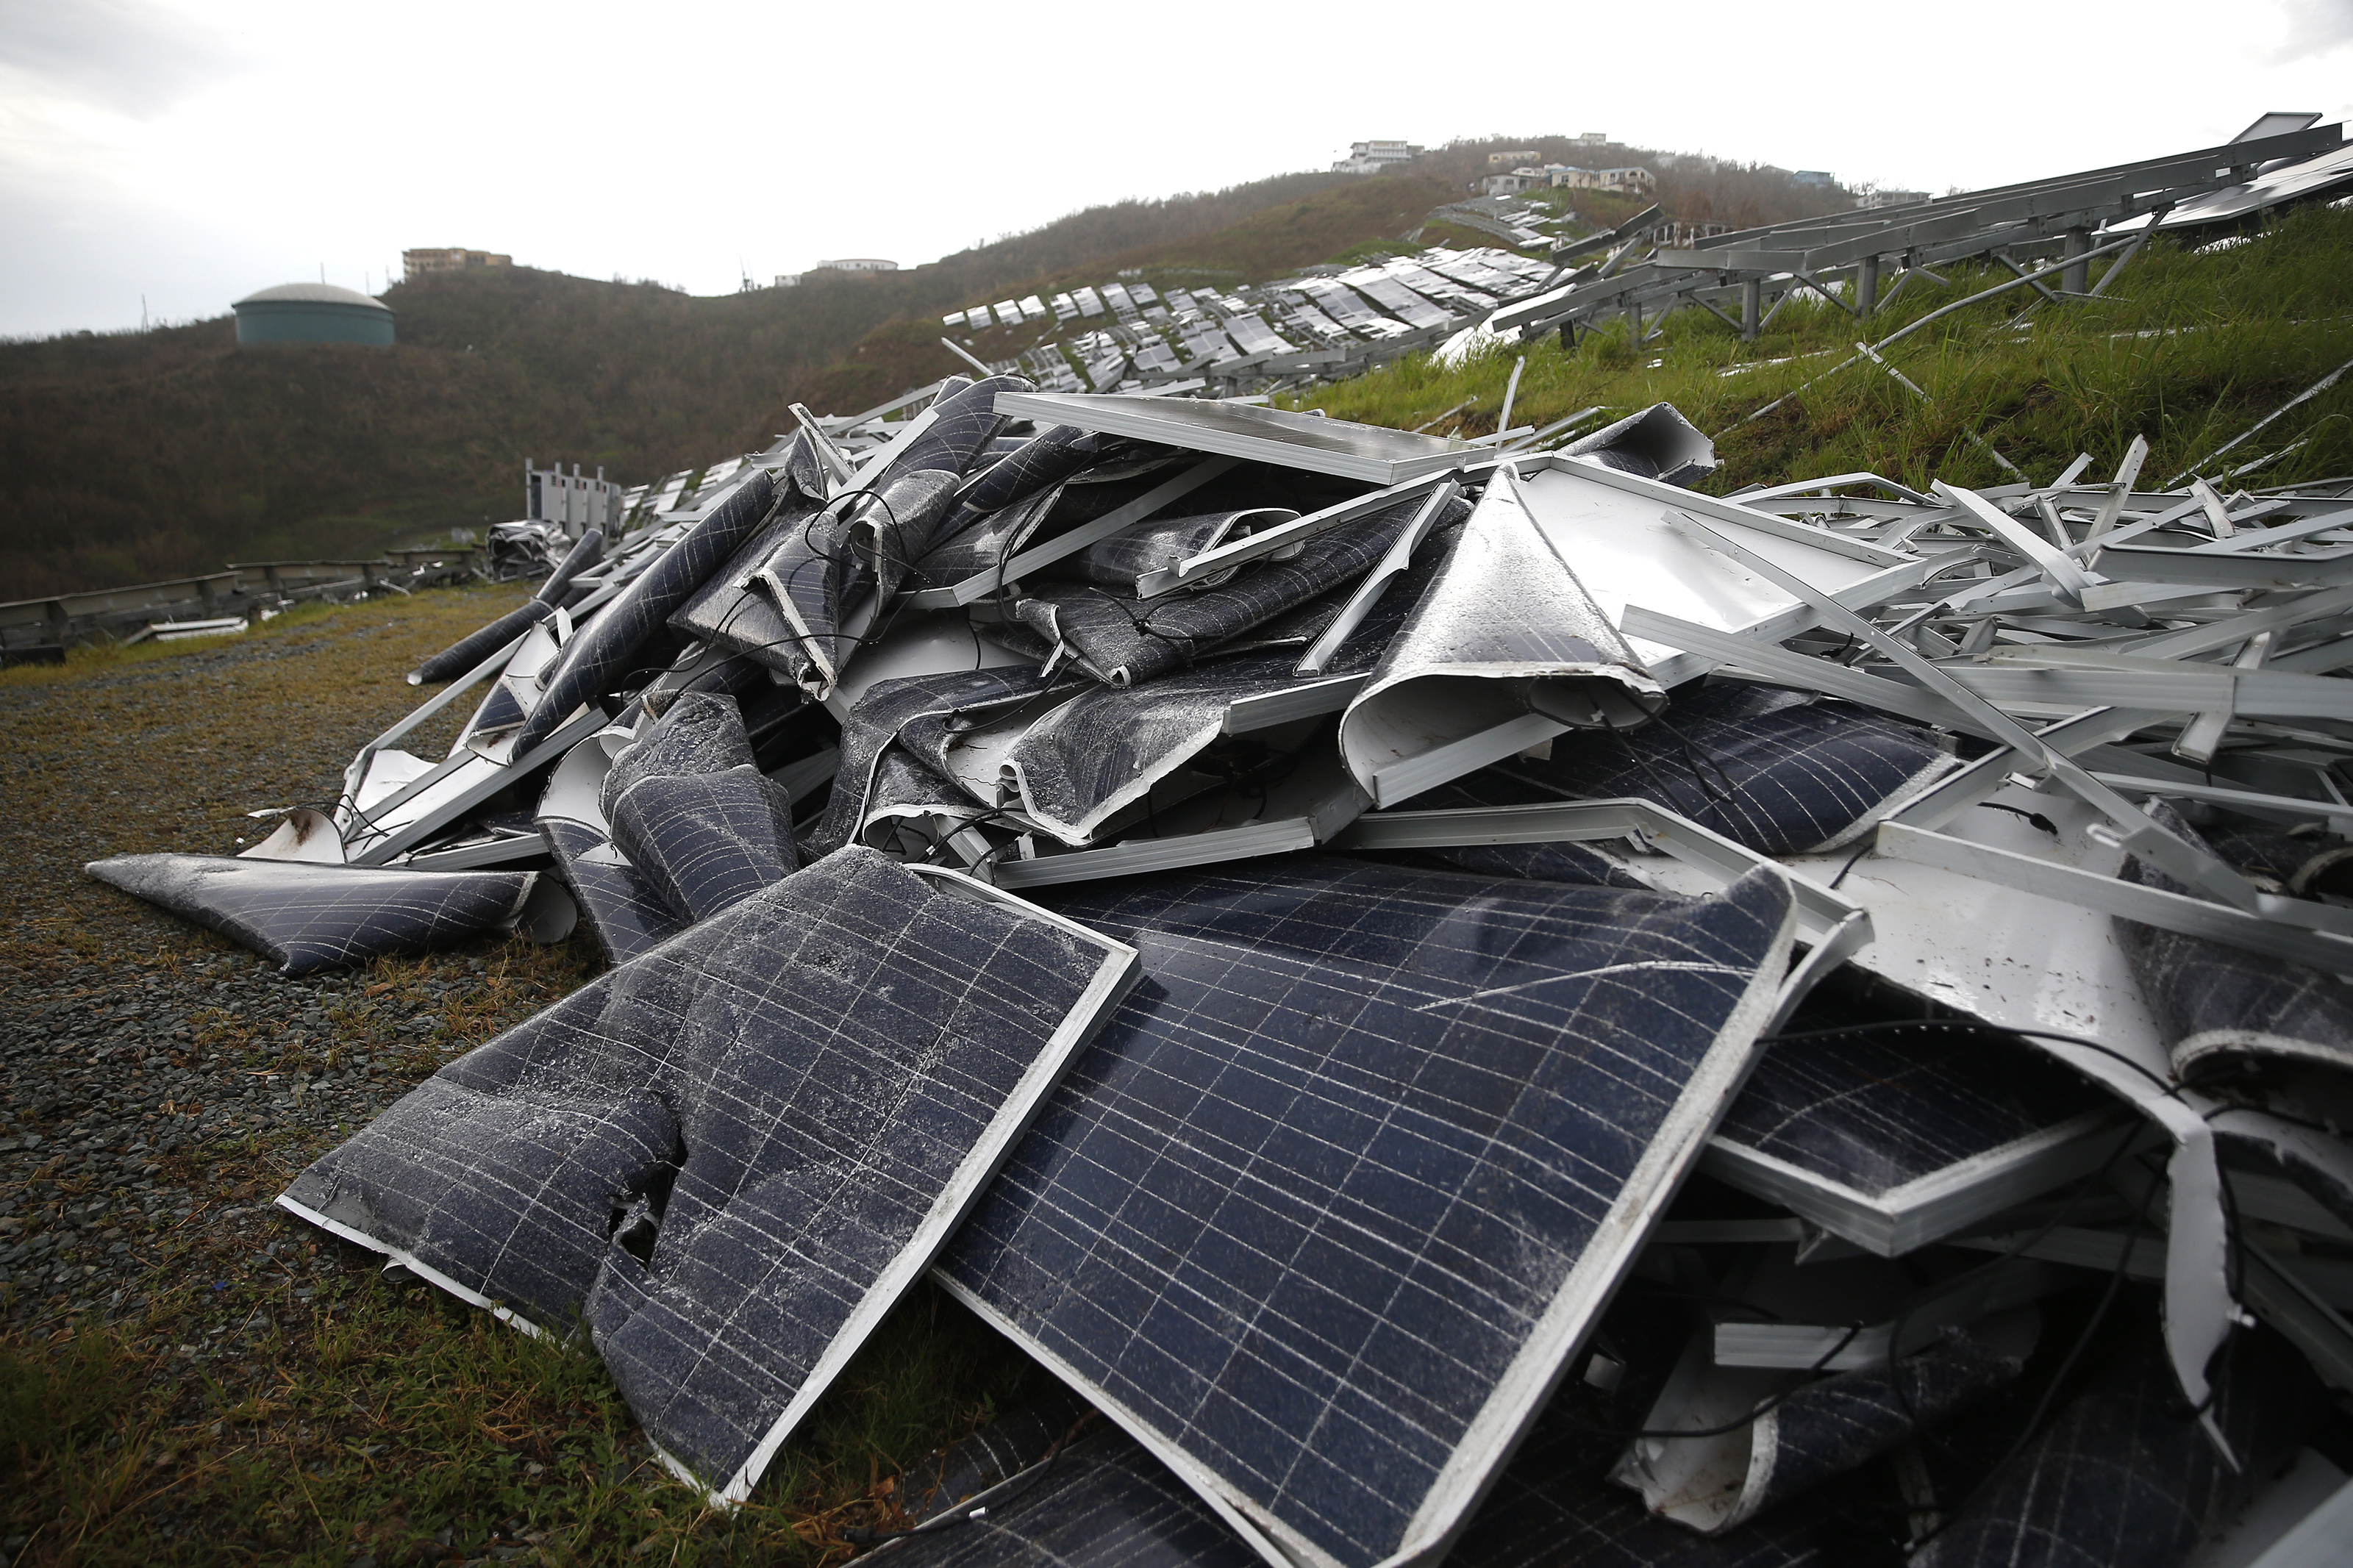 Hurricane Irma Aftermath On St. Thomas